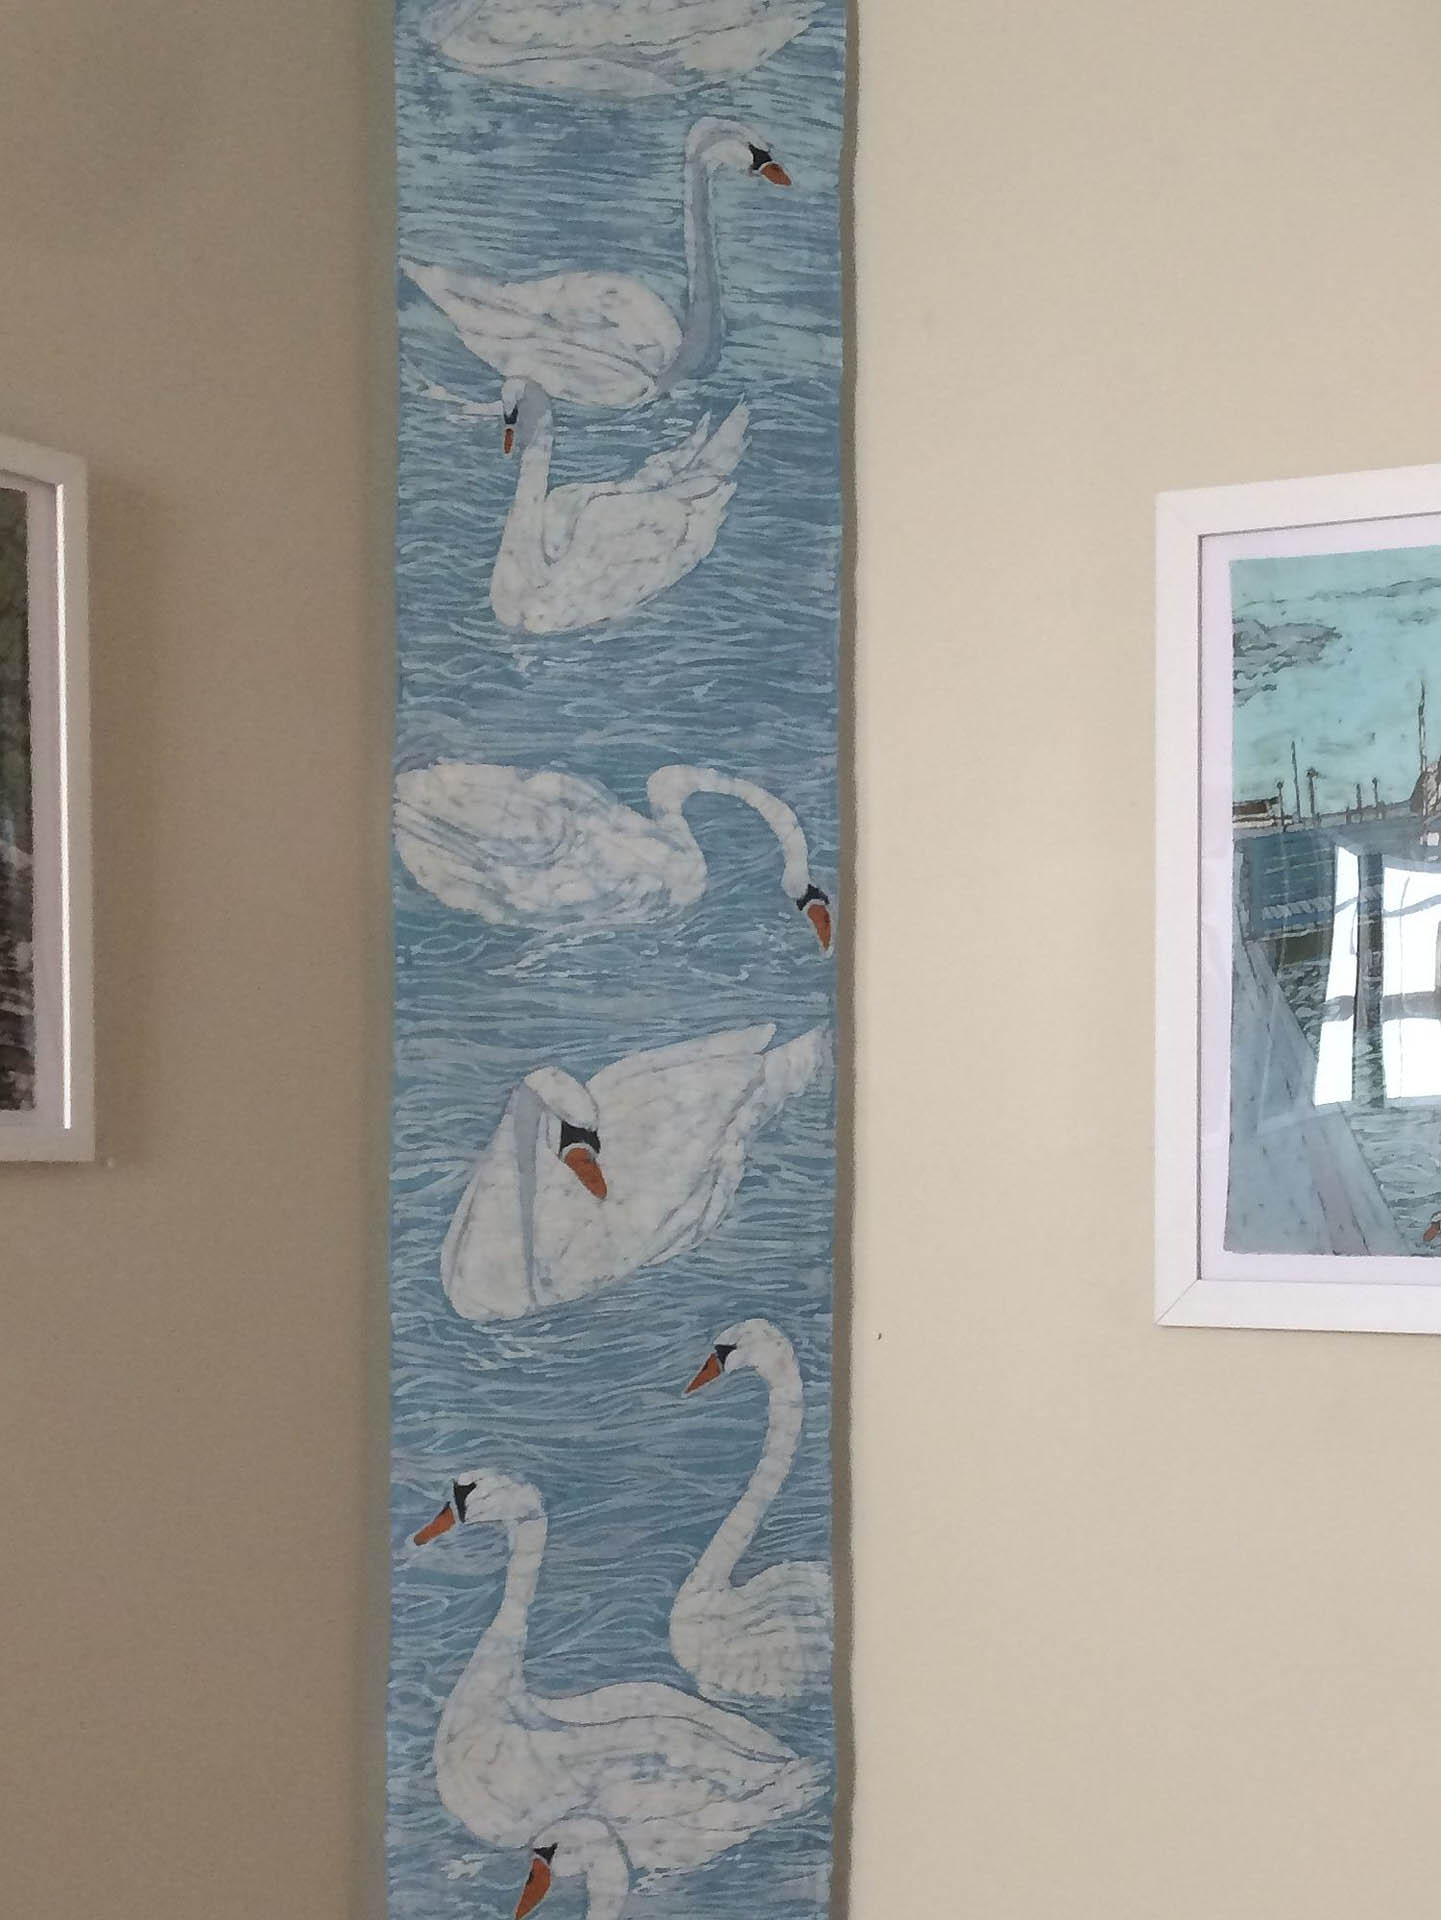 lenore-fiore-mills-8-swans-banner